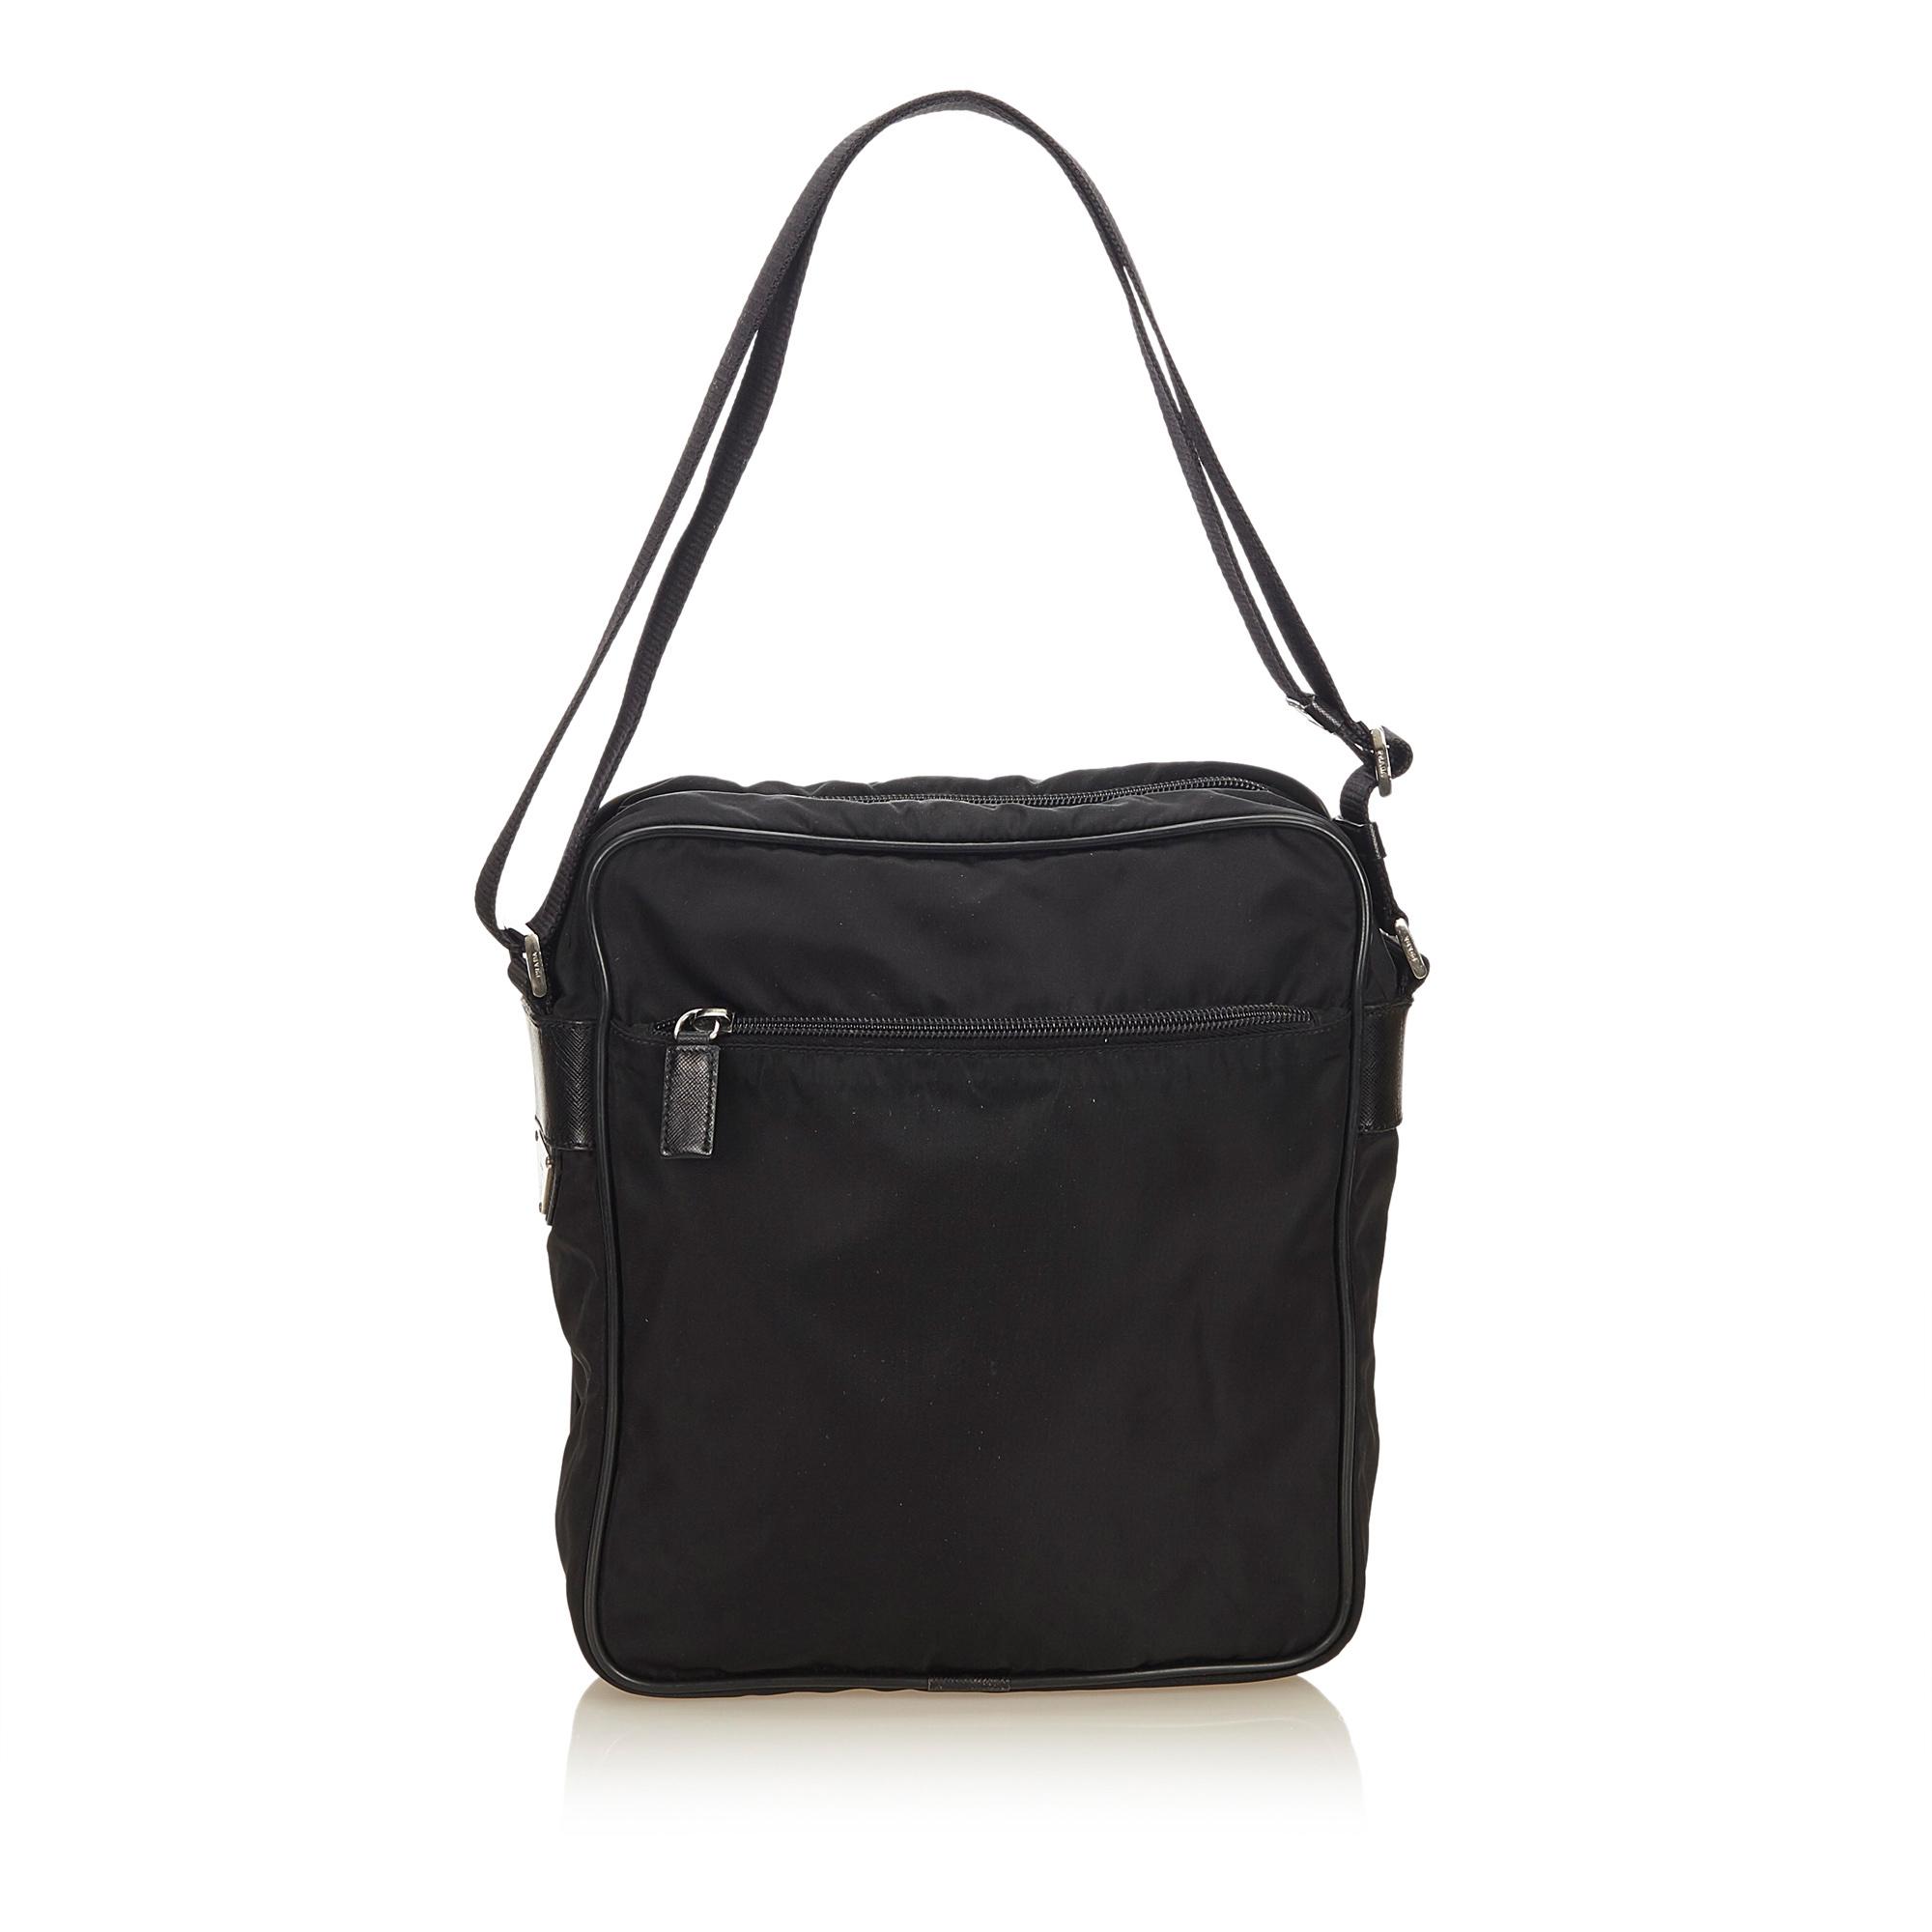 598759fdb9fb Image is loading Pre-Loved-Prada-Black-Nylon-Fabric-Crossbody-Bag-